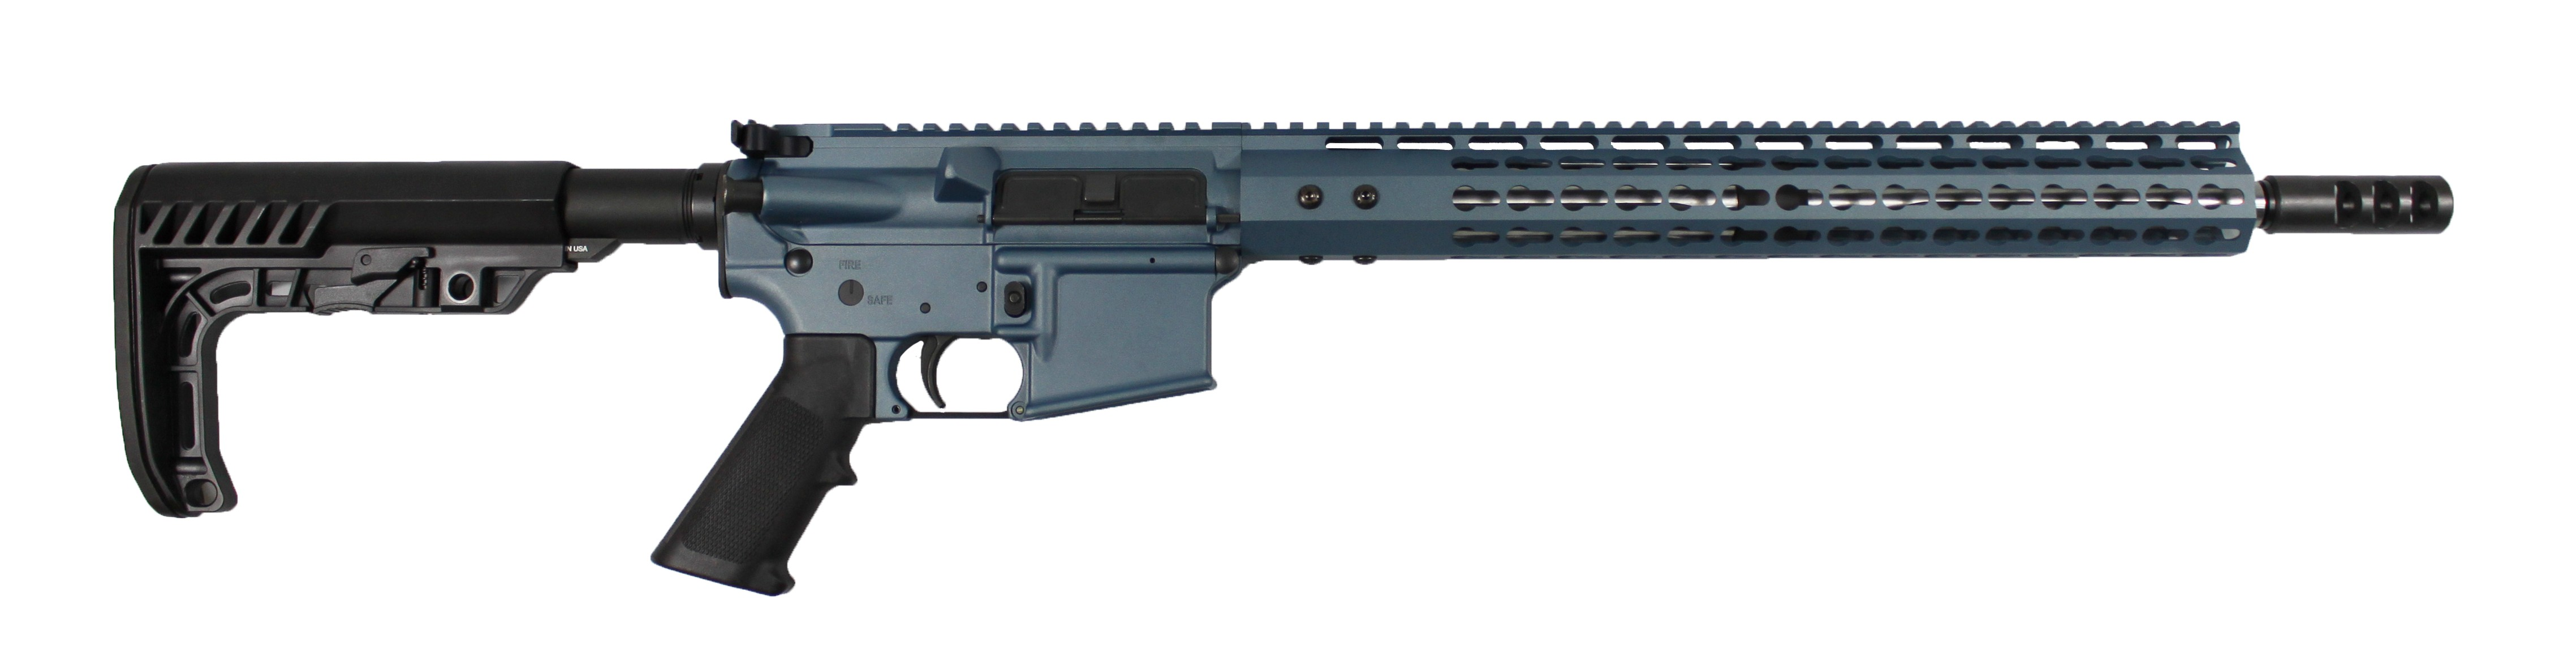 ar 15 complete rifle cbc industries limited edition blue titanium rifle 223 5 56 stainless steel straight flute mb05 2 flash hider minimalist buttstock